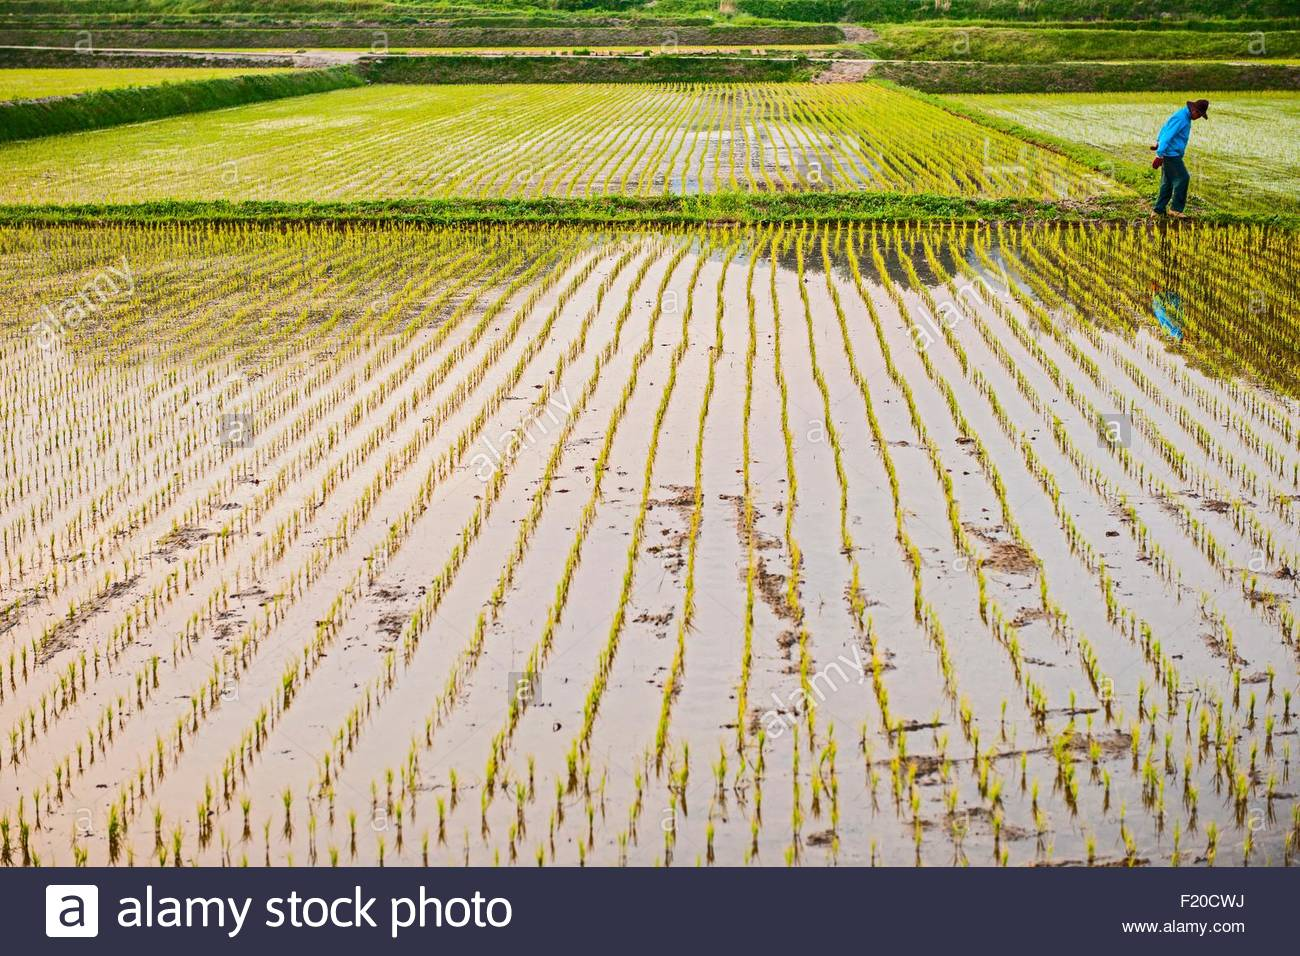 Rice field close to Seoraksan National Park, Gangwon, South Korea - Stock Image